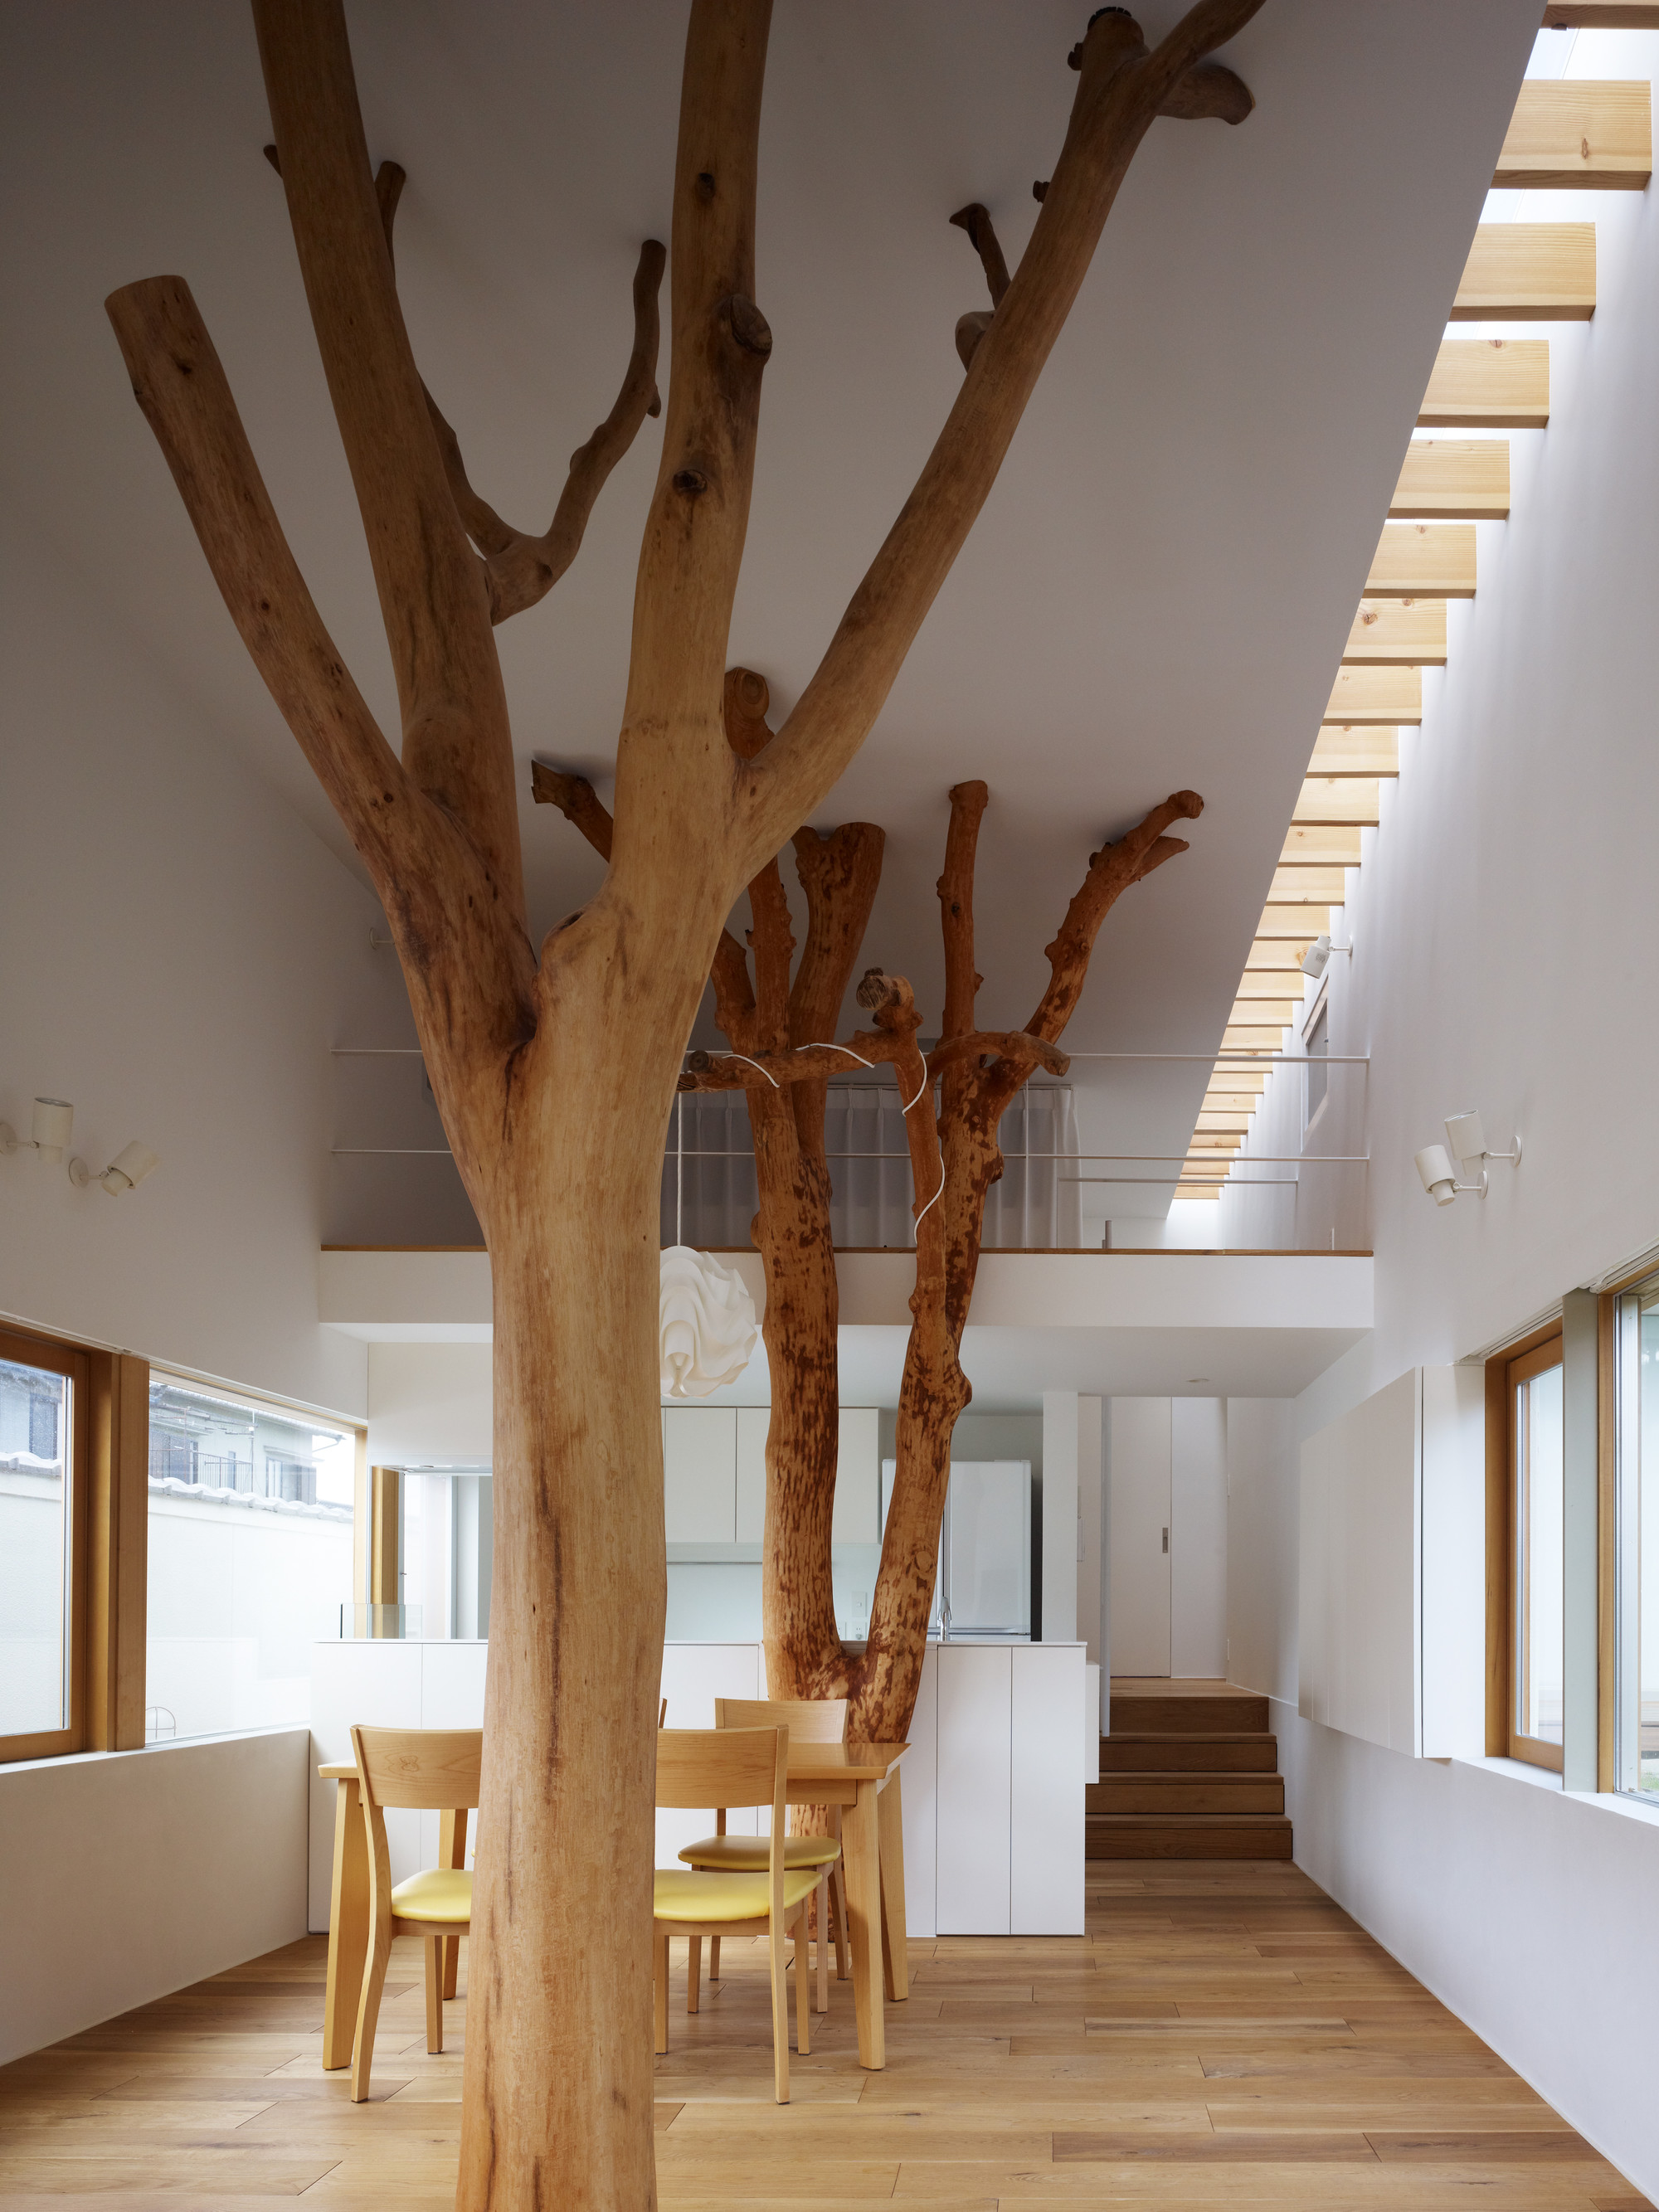 Gallery of Garden Tree House / Hironaka Ogawa & Associates - 1